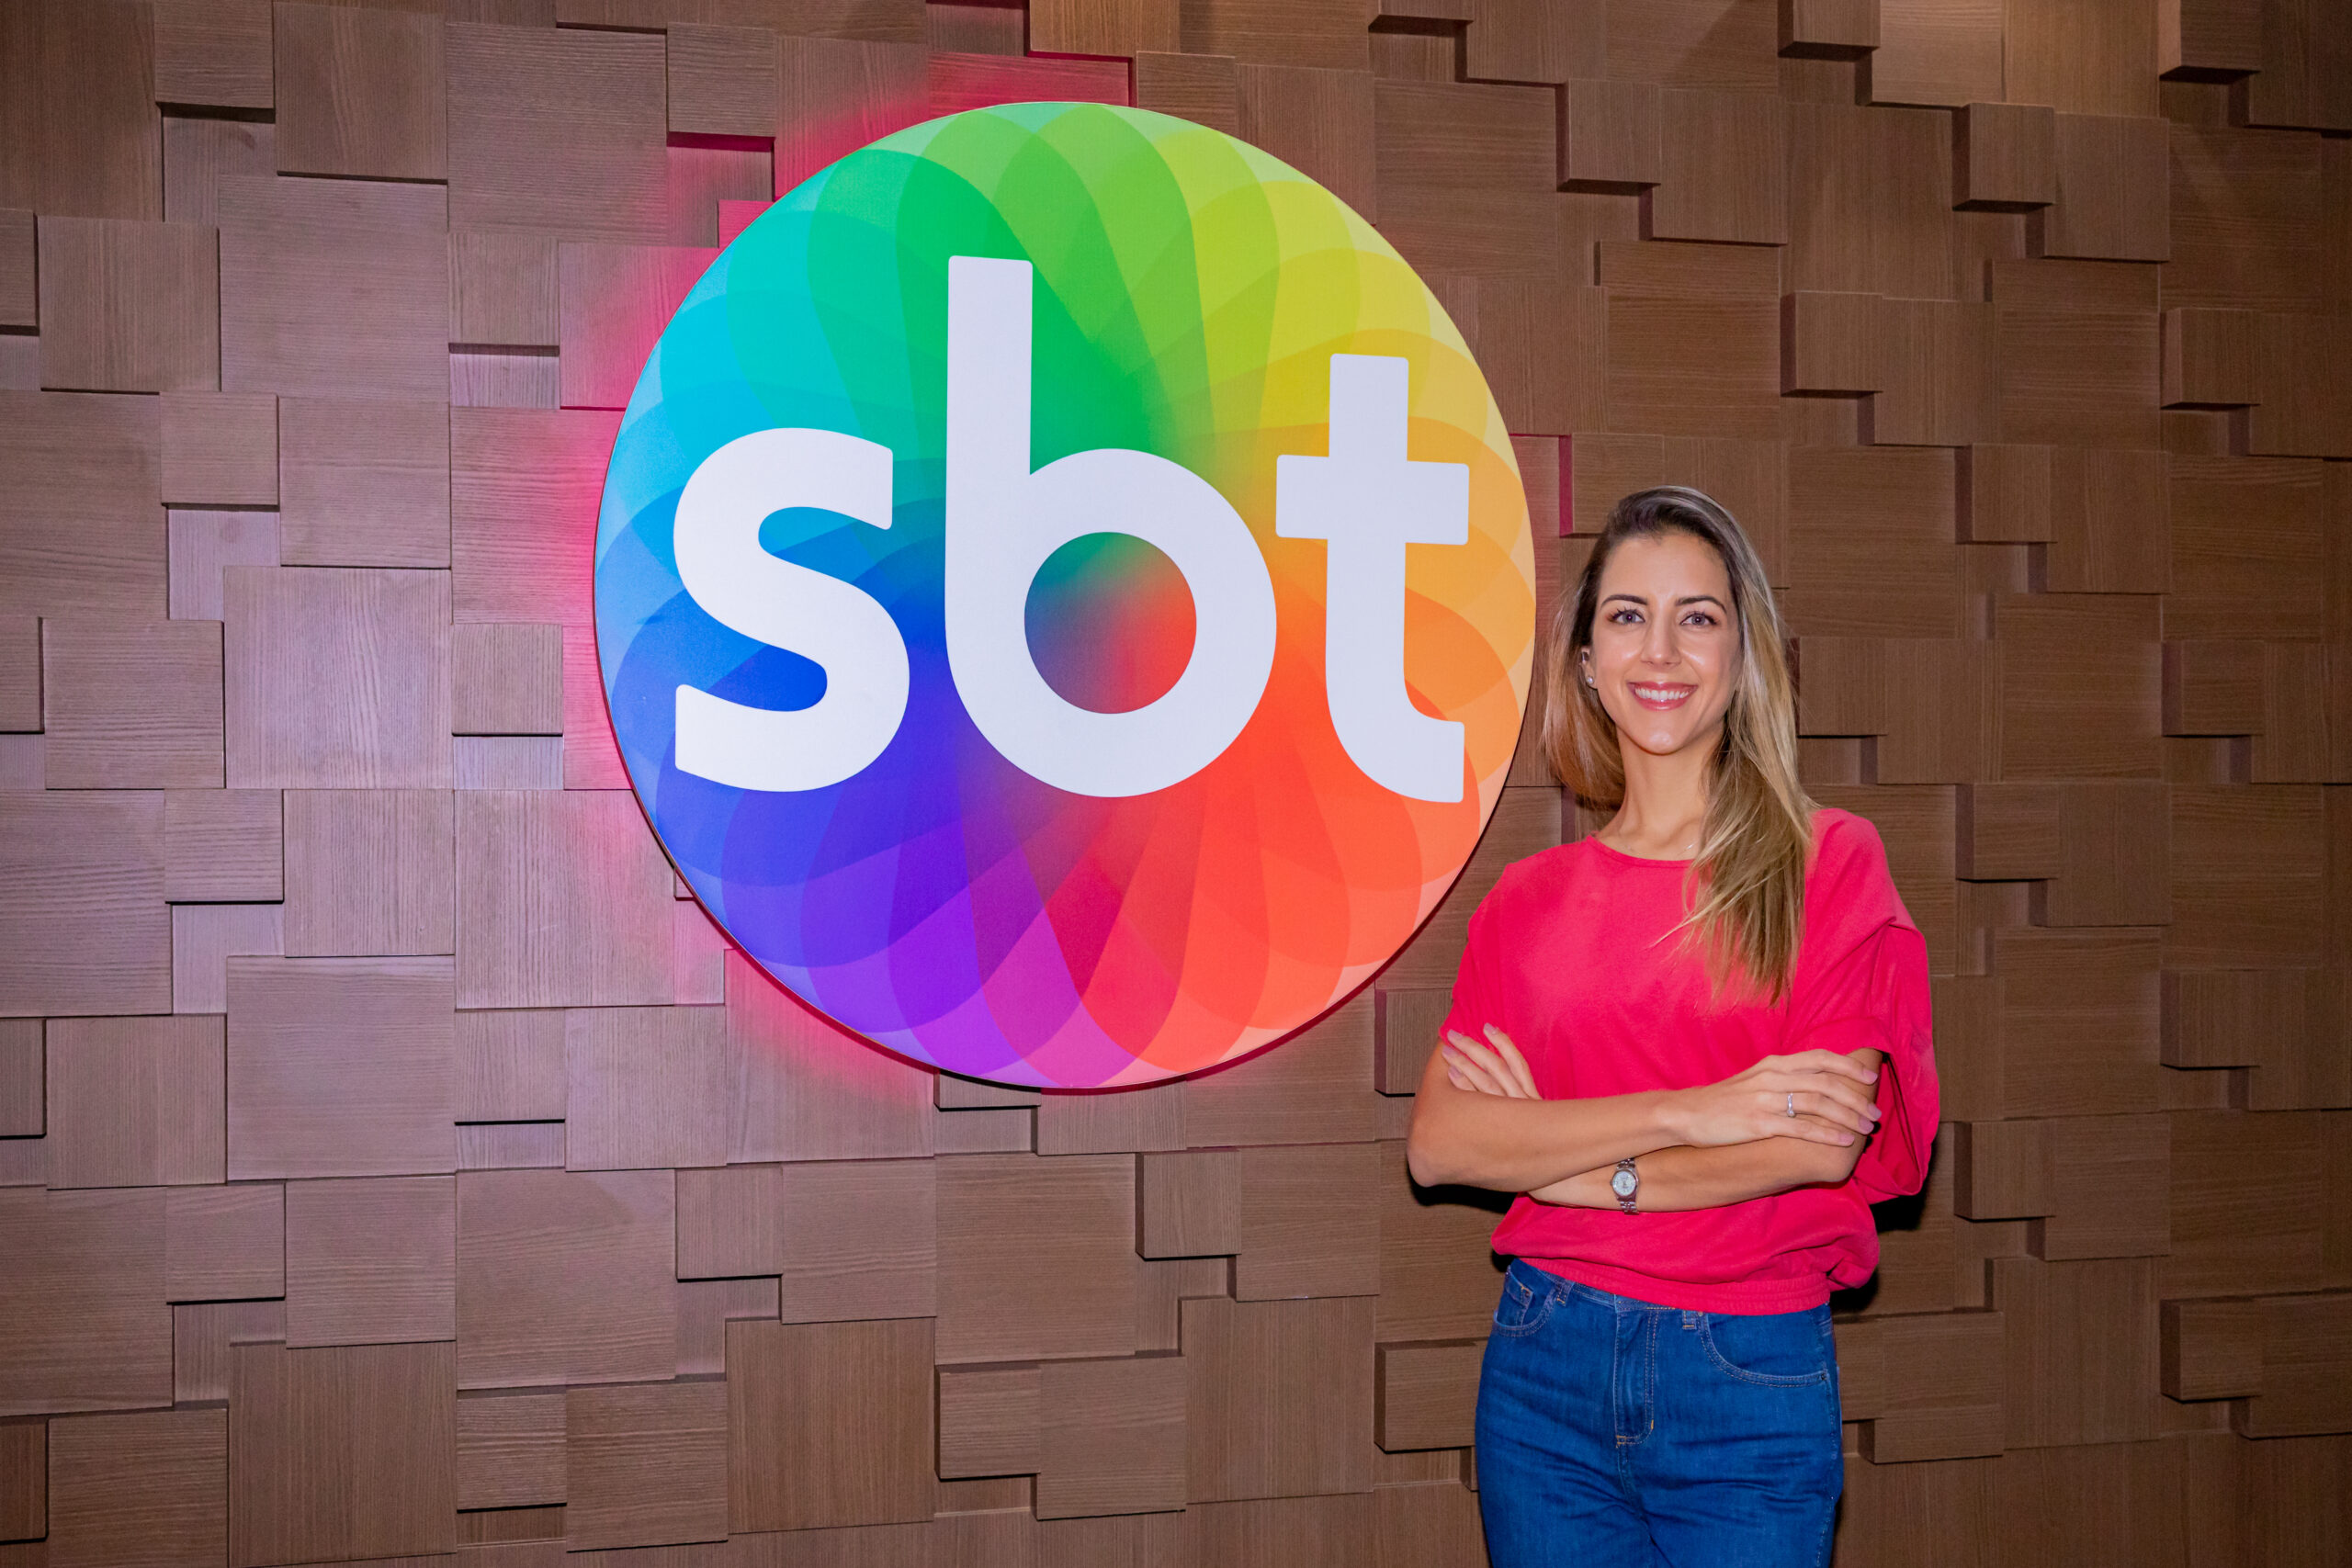 Domitila Becker-SBT